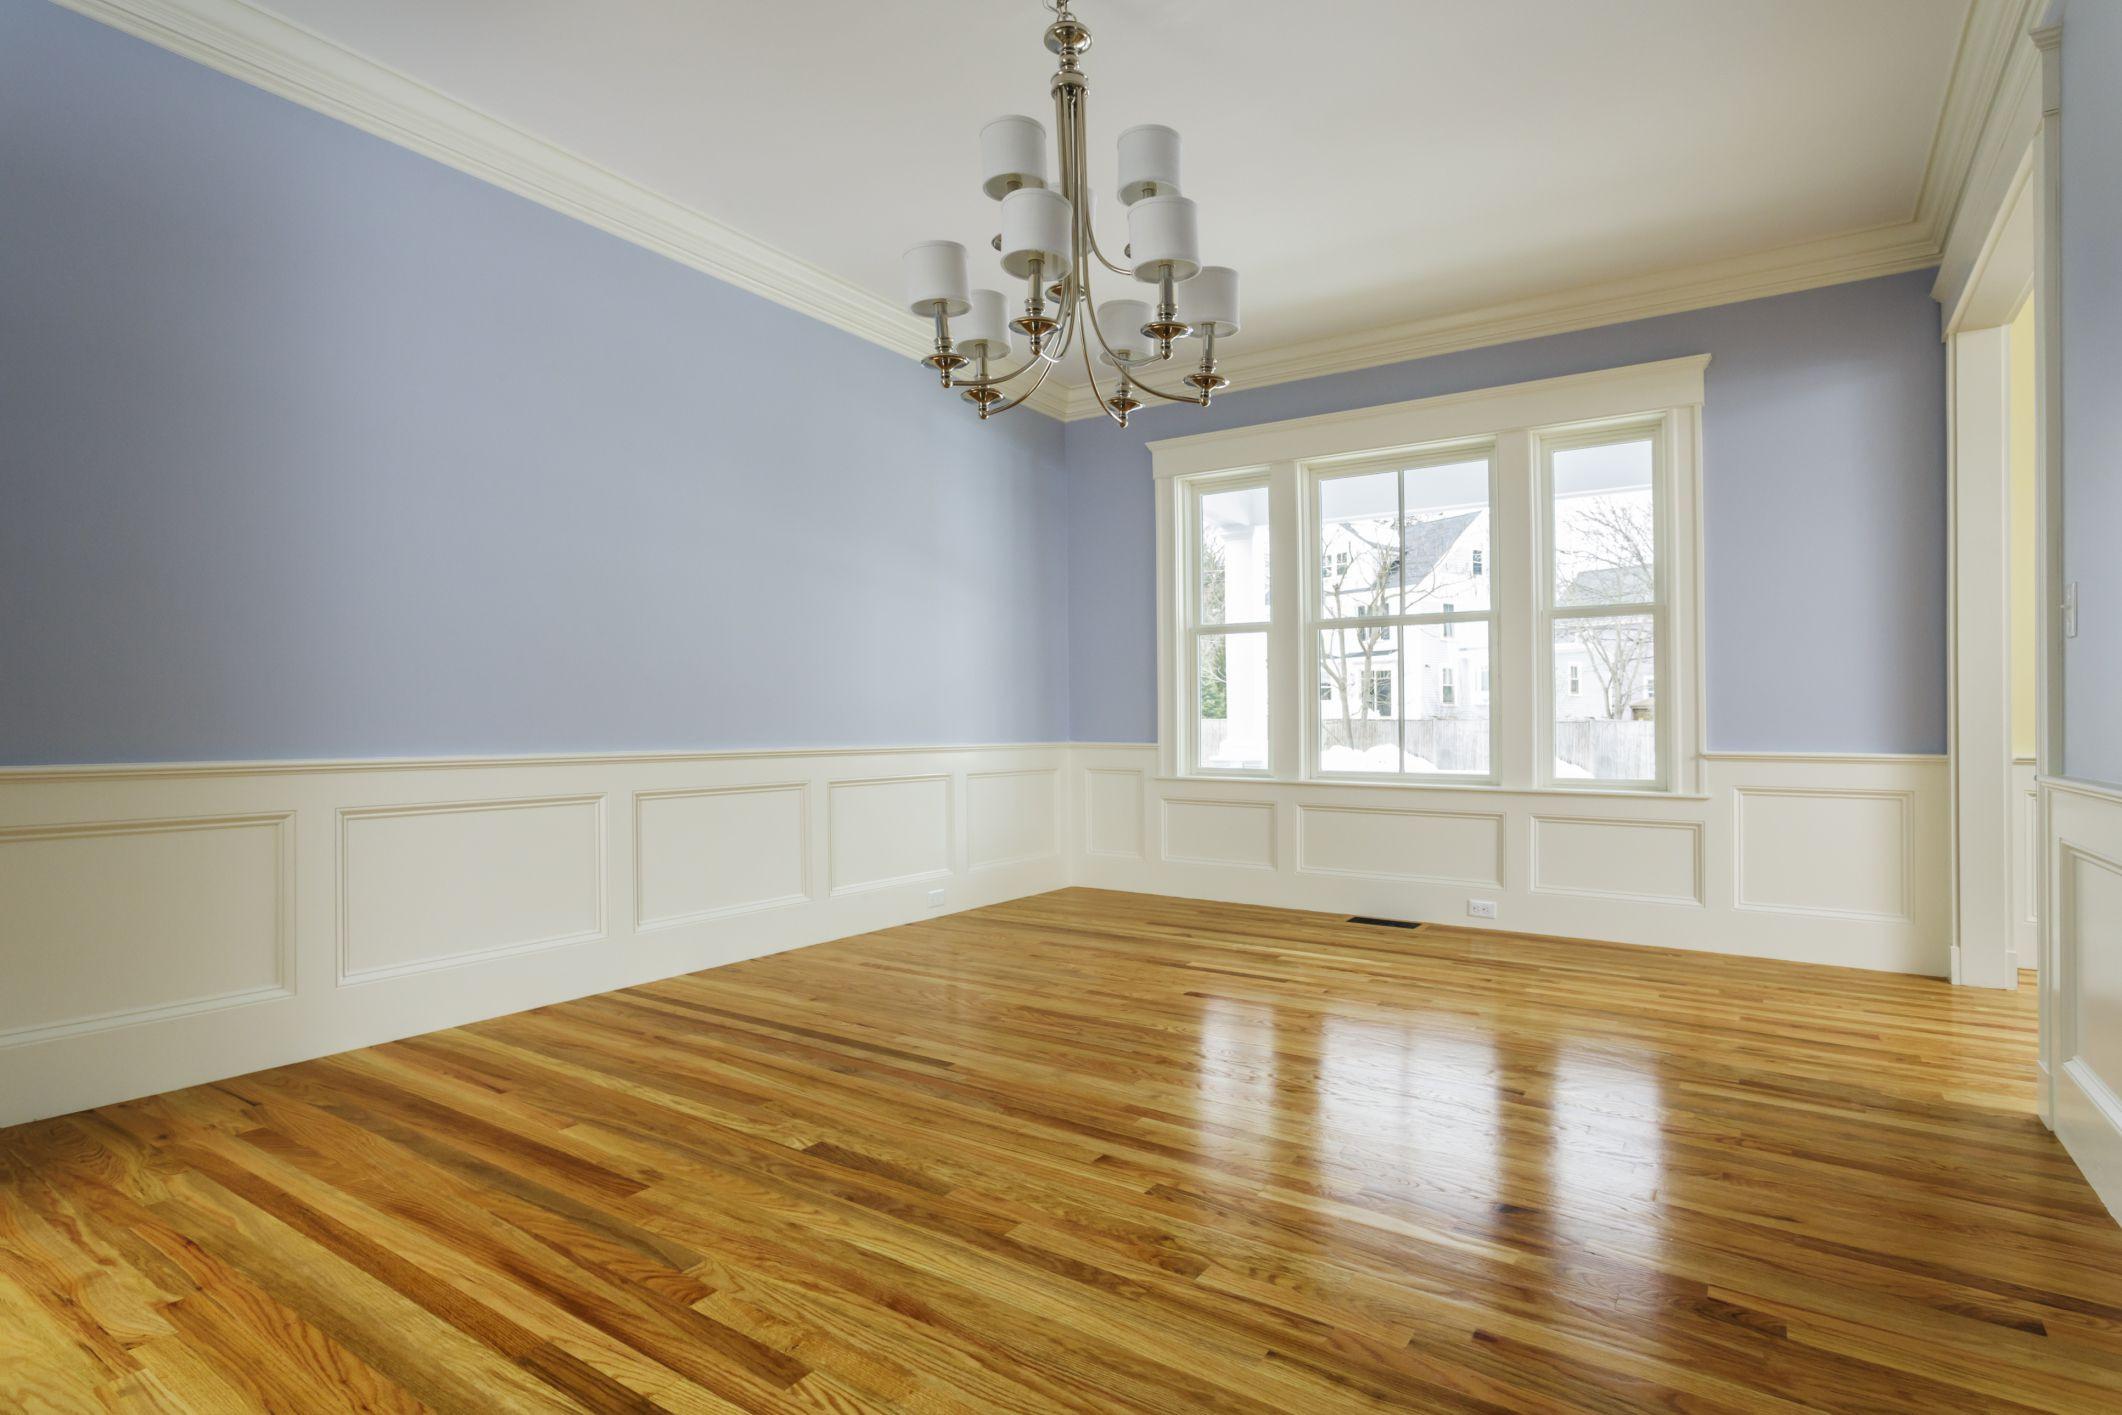 hardwood floors under carpet of the cost to refinish hardwood floors inside 168686572 highres 56a2fd773df78cf7727b6cb3